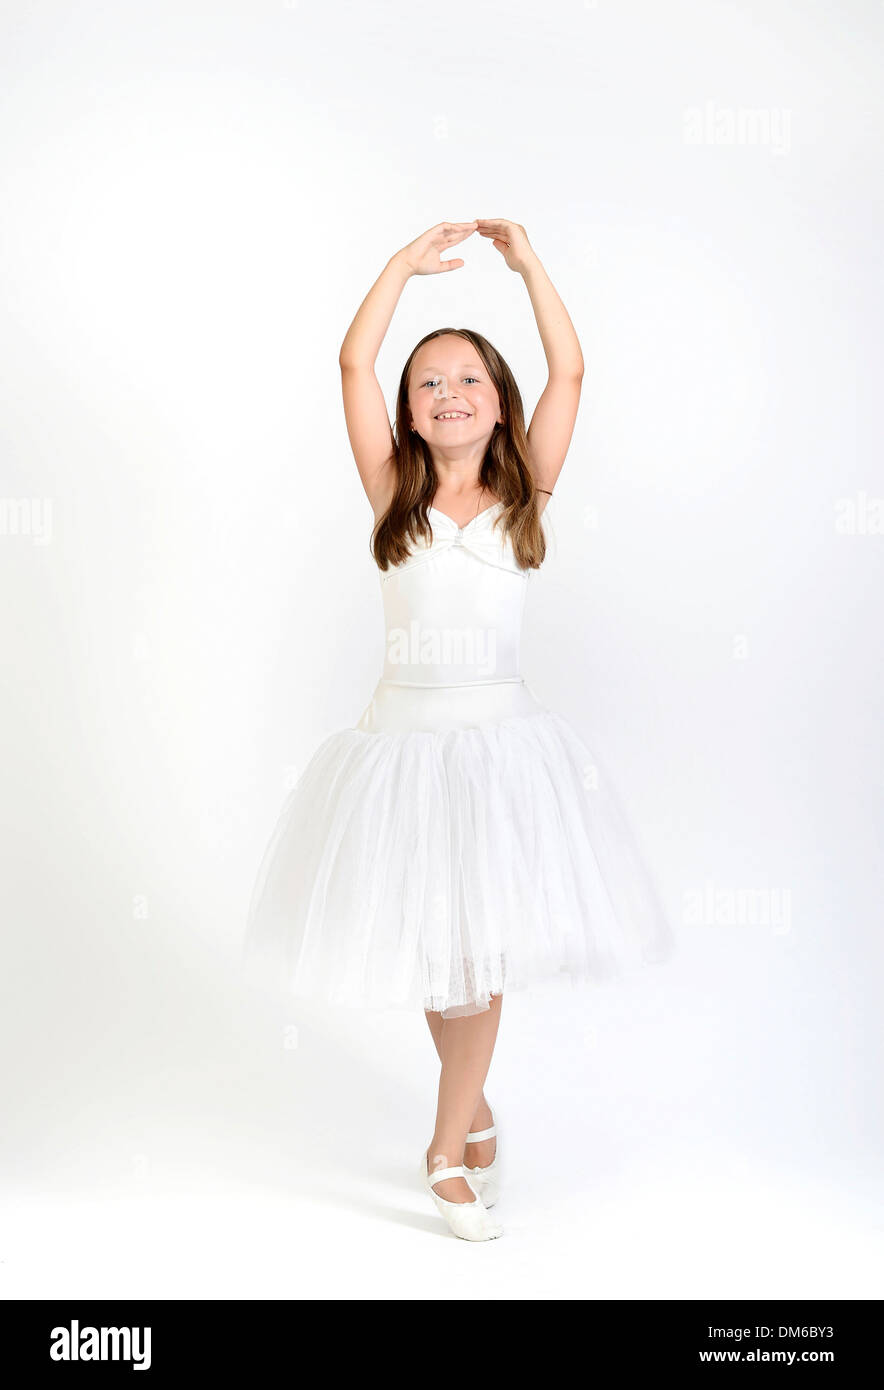 4f28ff534 Tutu Tutus Ballerina Stock Photos & Tutu Tutus Ballerina Stock ...